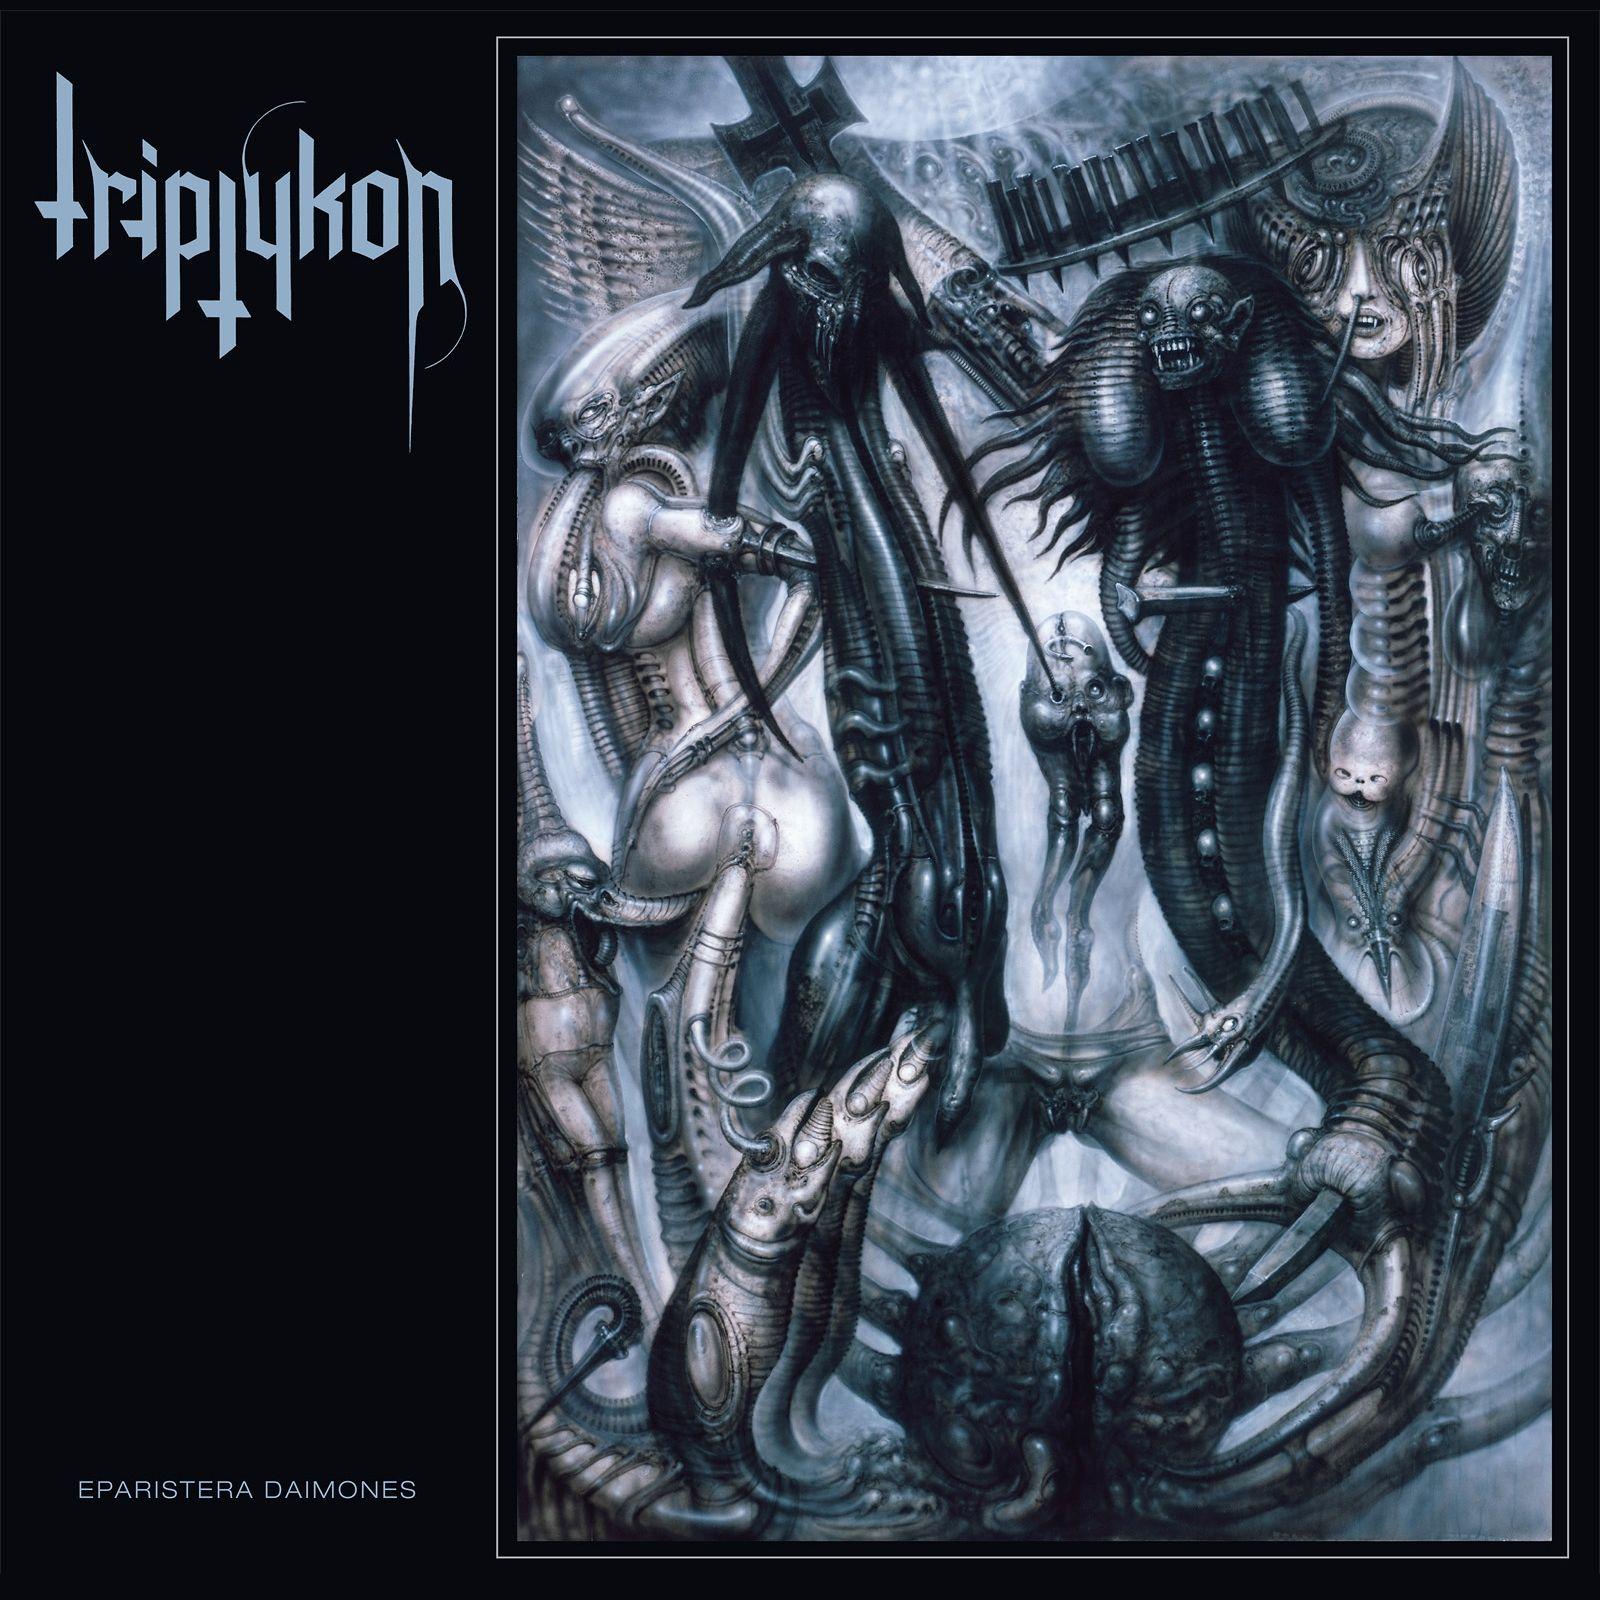 Triptykon - Eparistera Daimones album cover